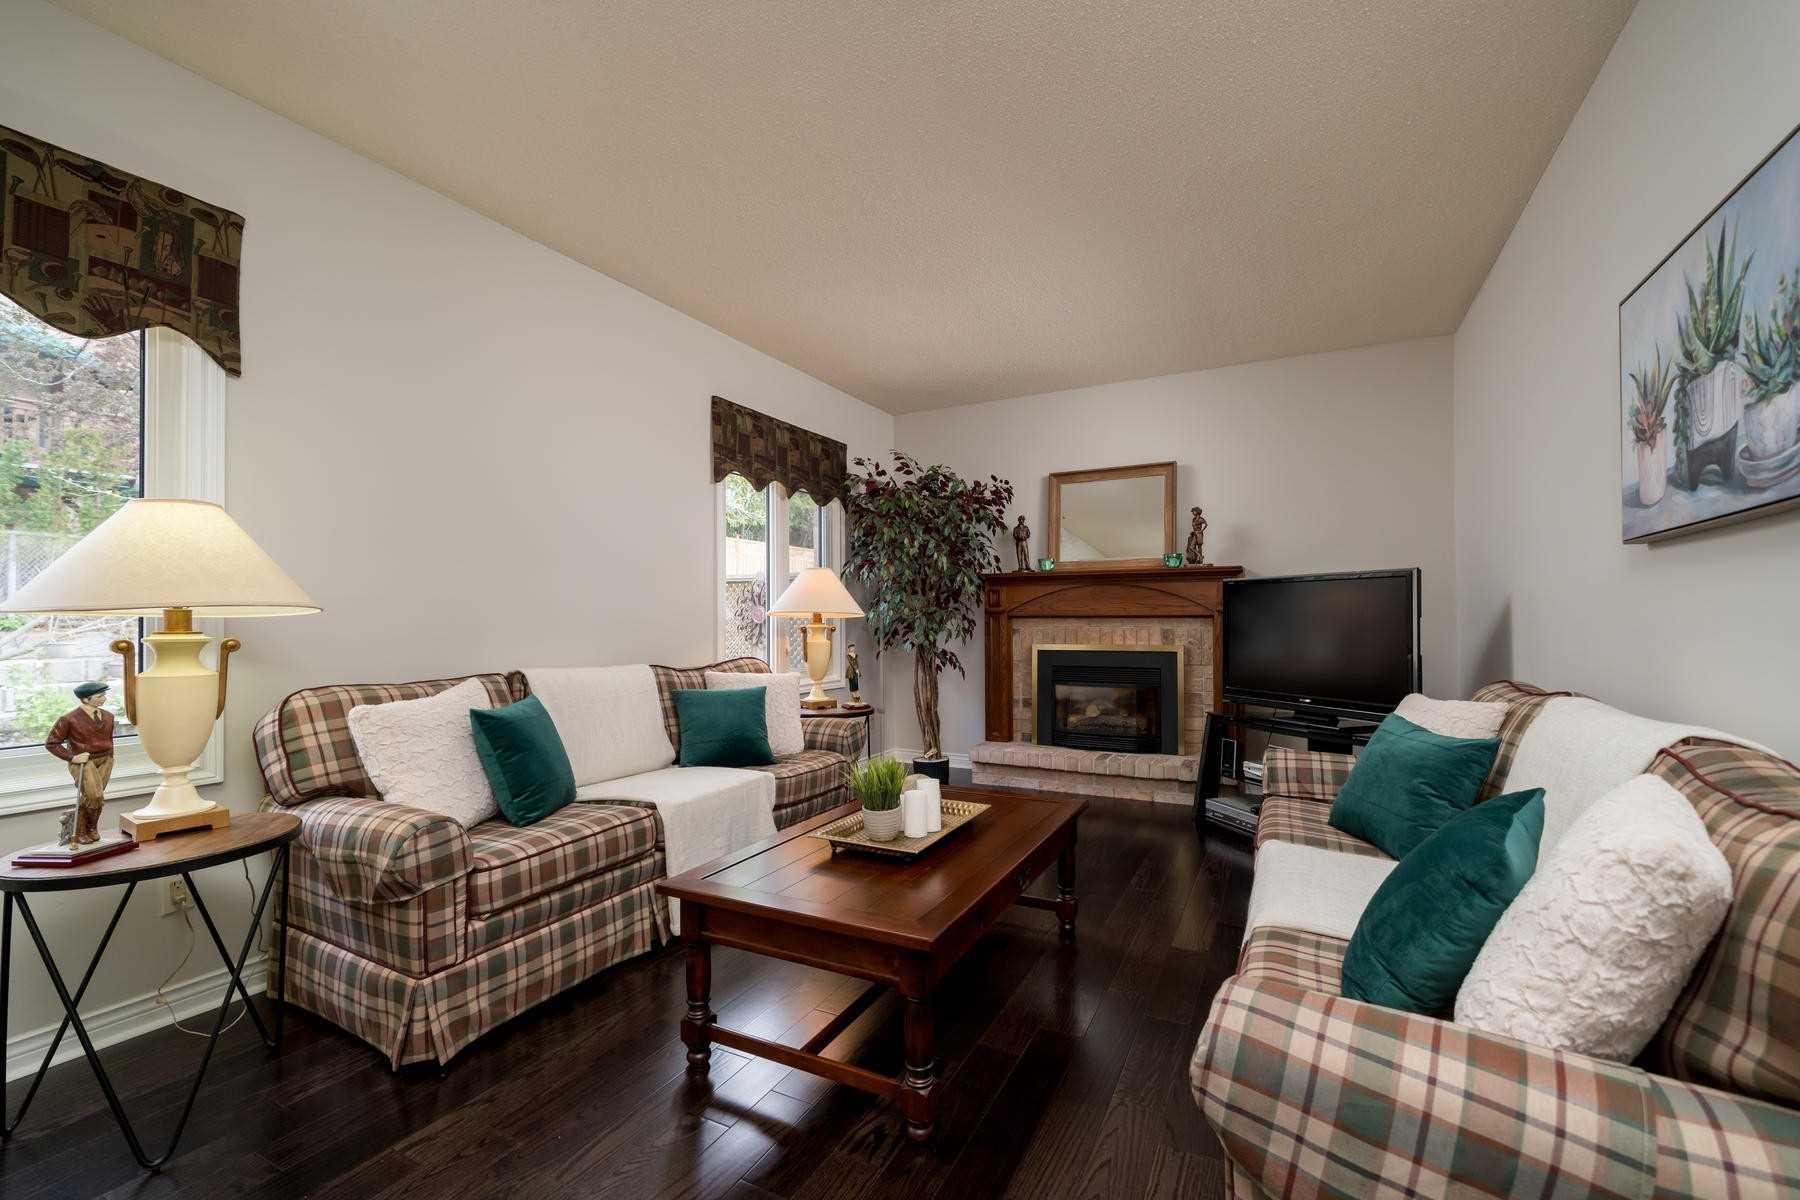 1706 Covington Terr, Mississauga W4461705